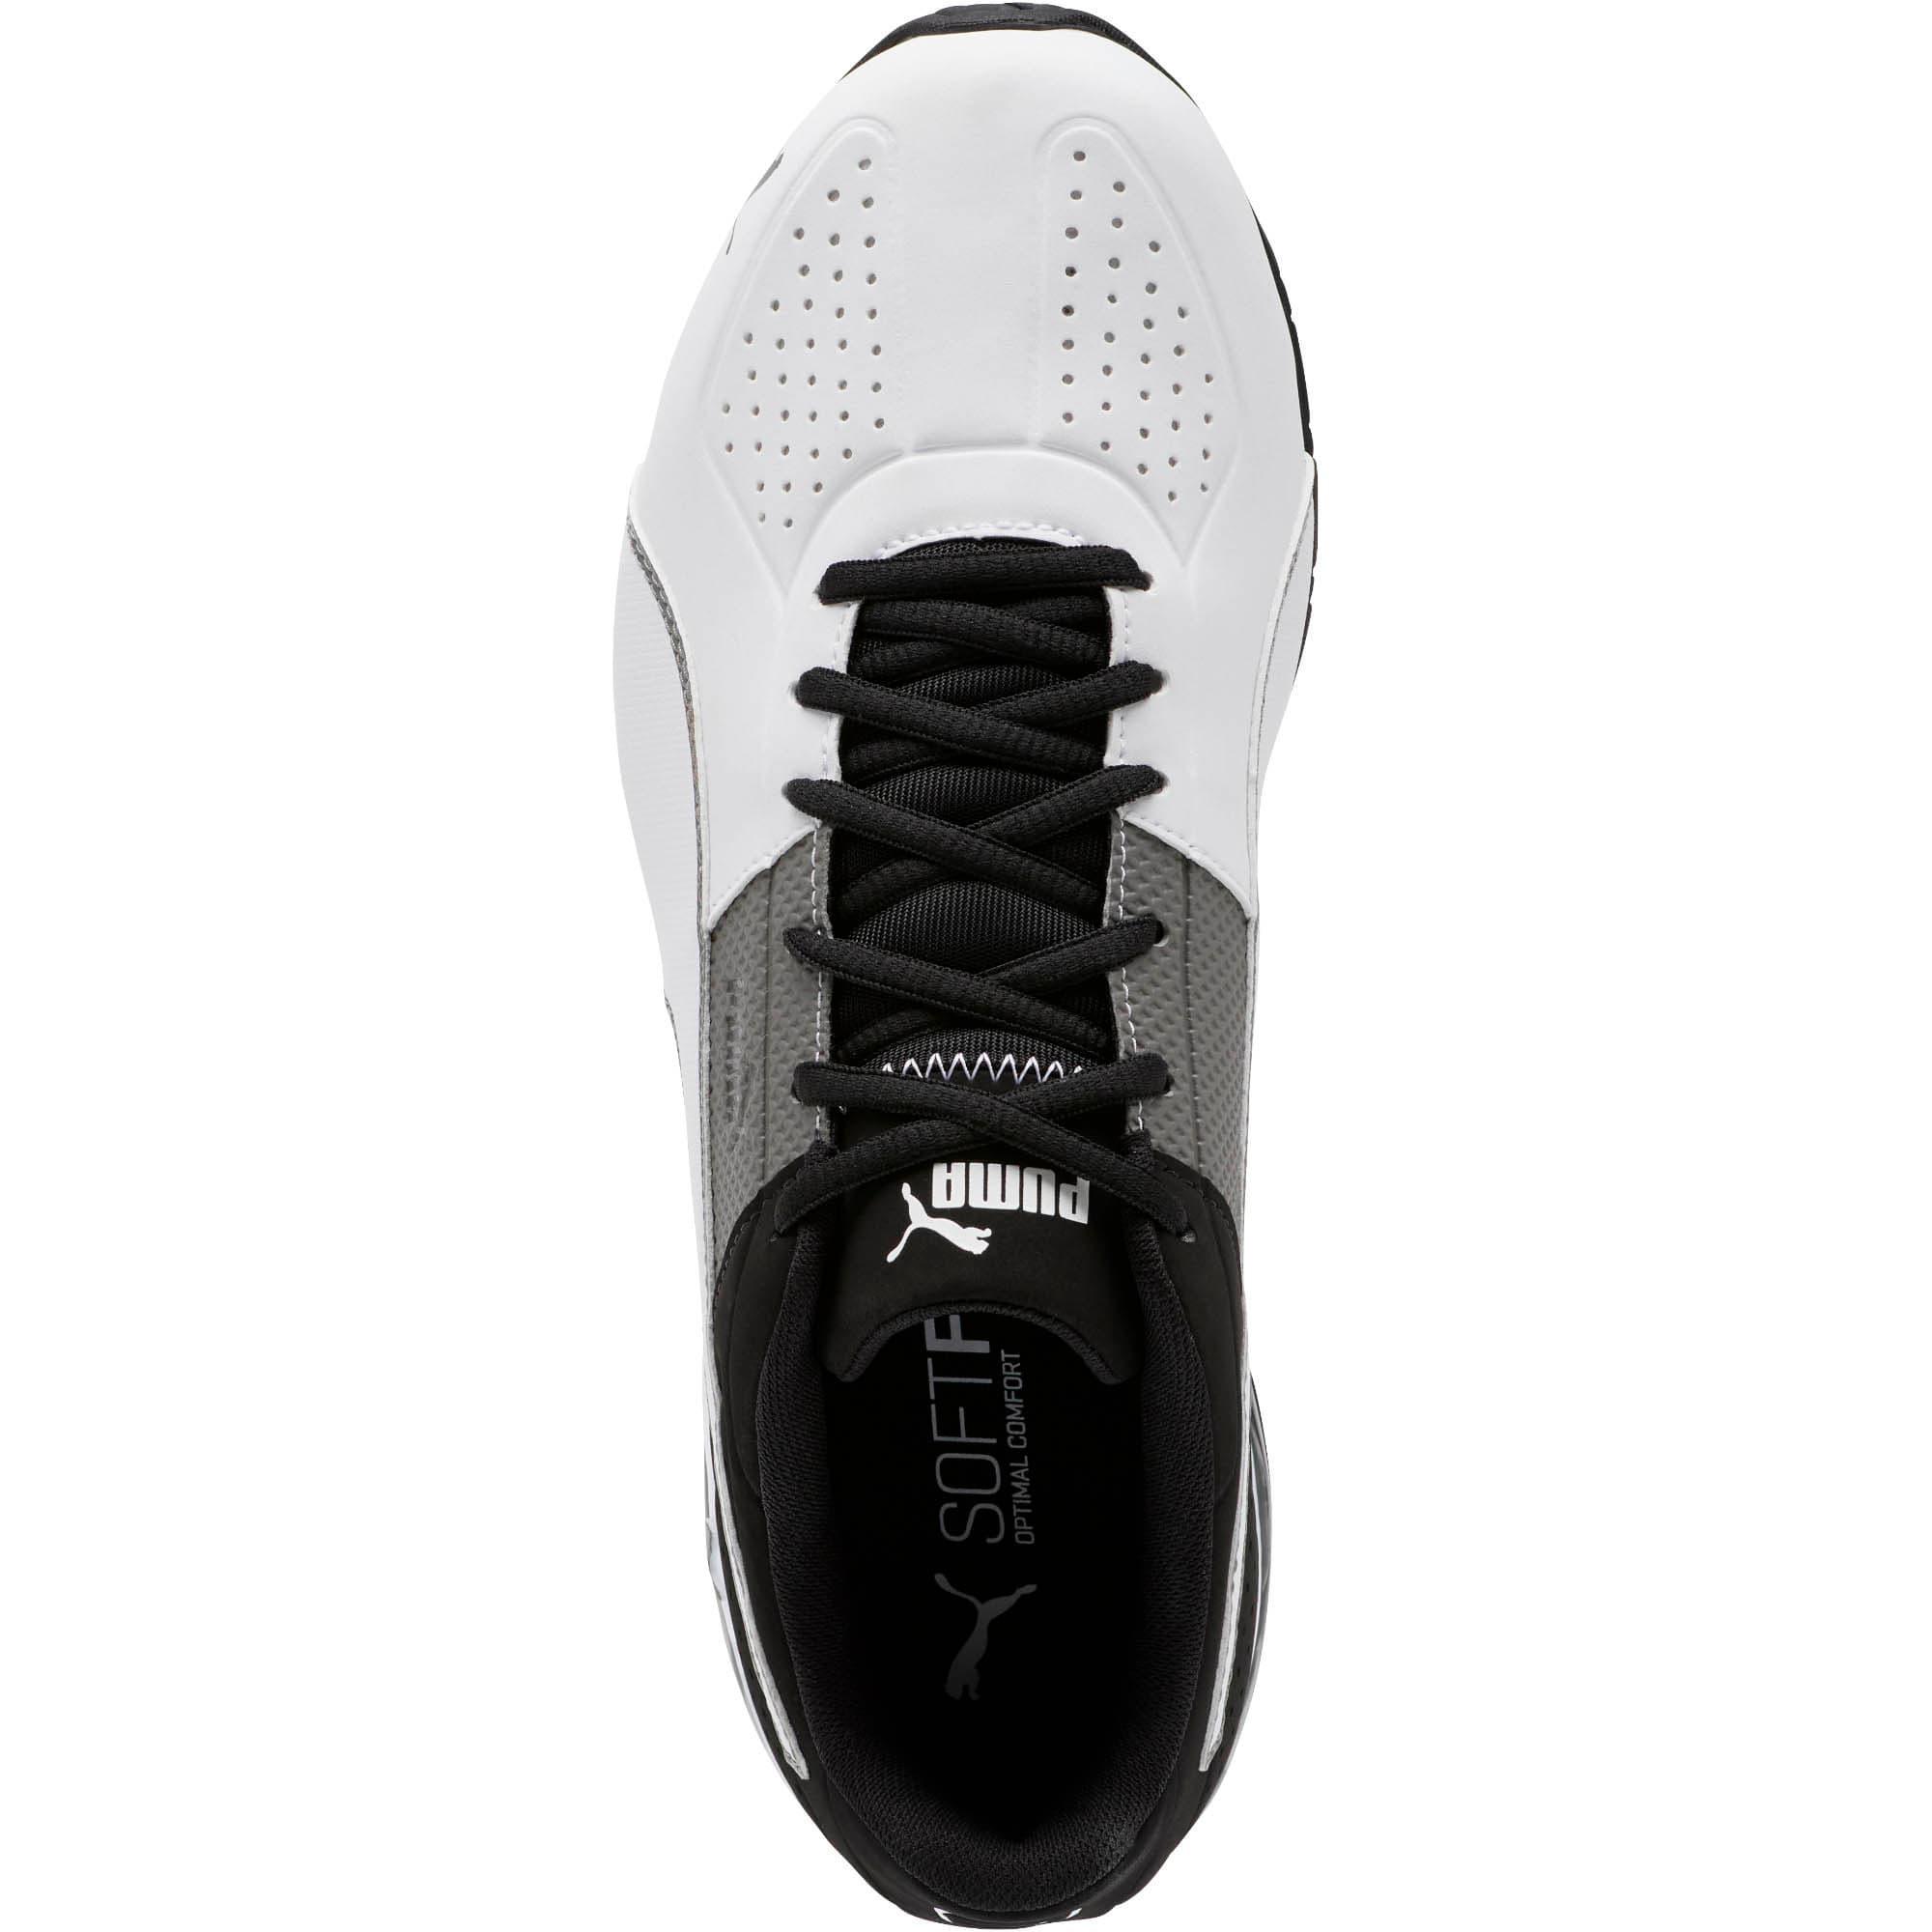 Thumbnail 5 of CELL Surin 2 Matte Men's Training Shoes, Charcoal Gray-Puma White, medium